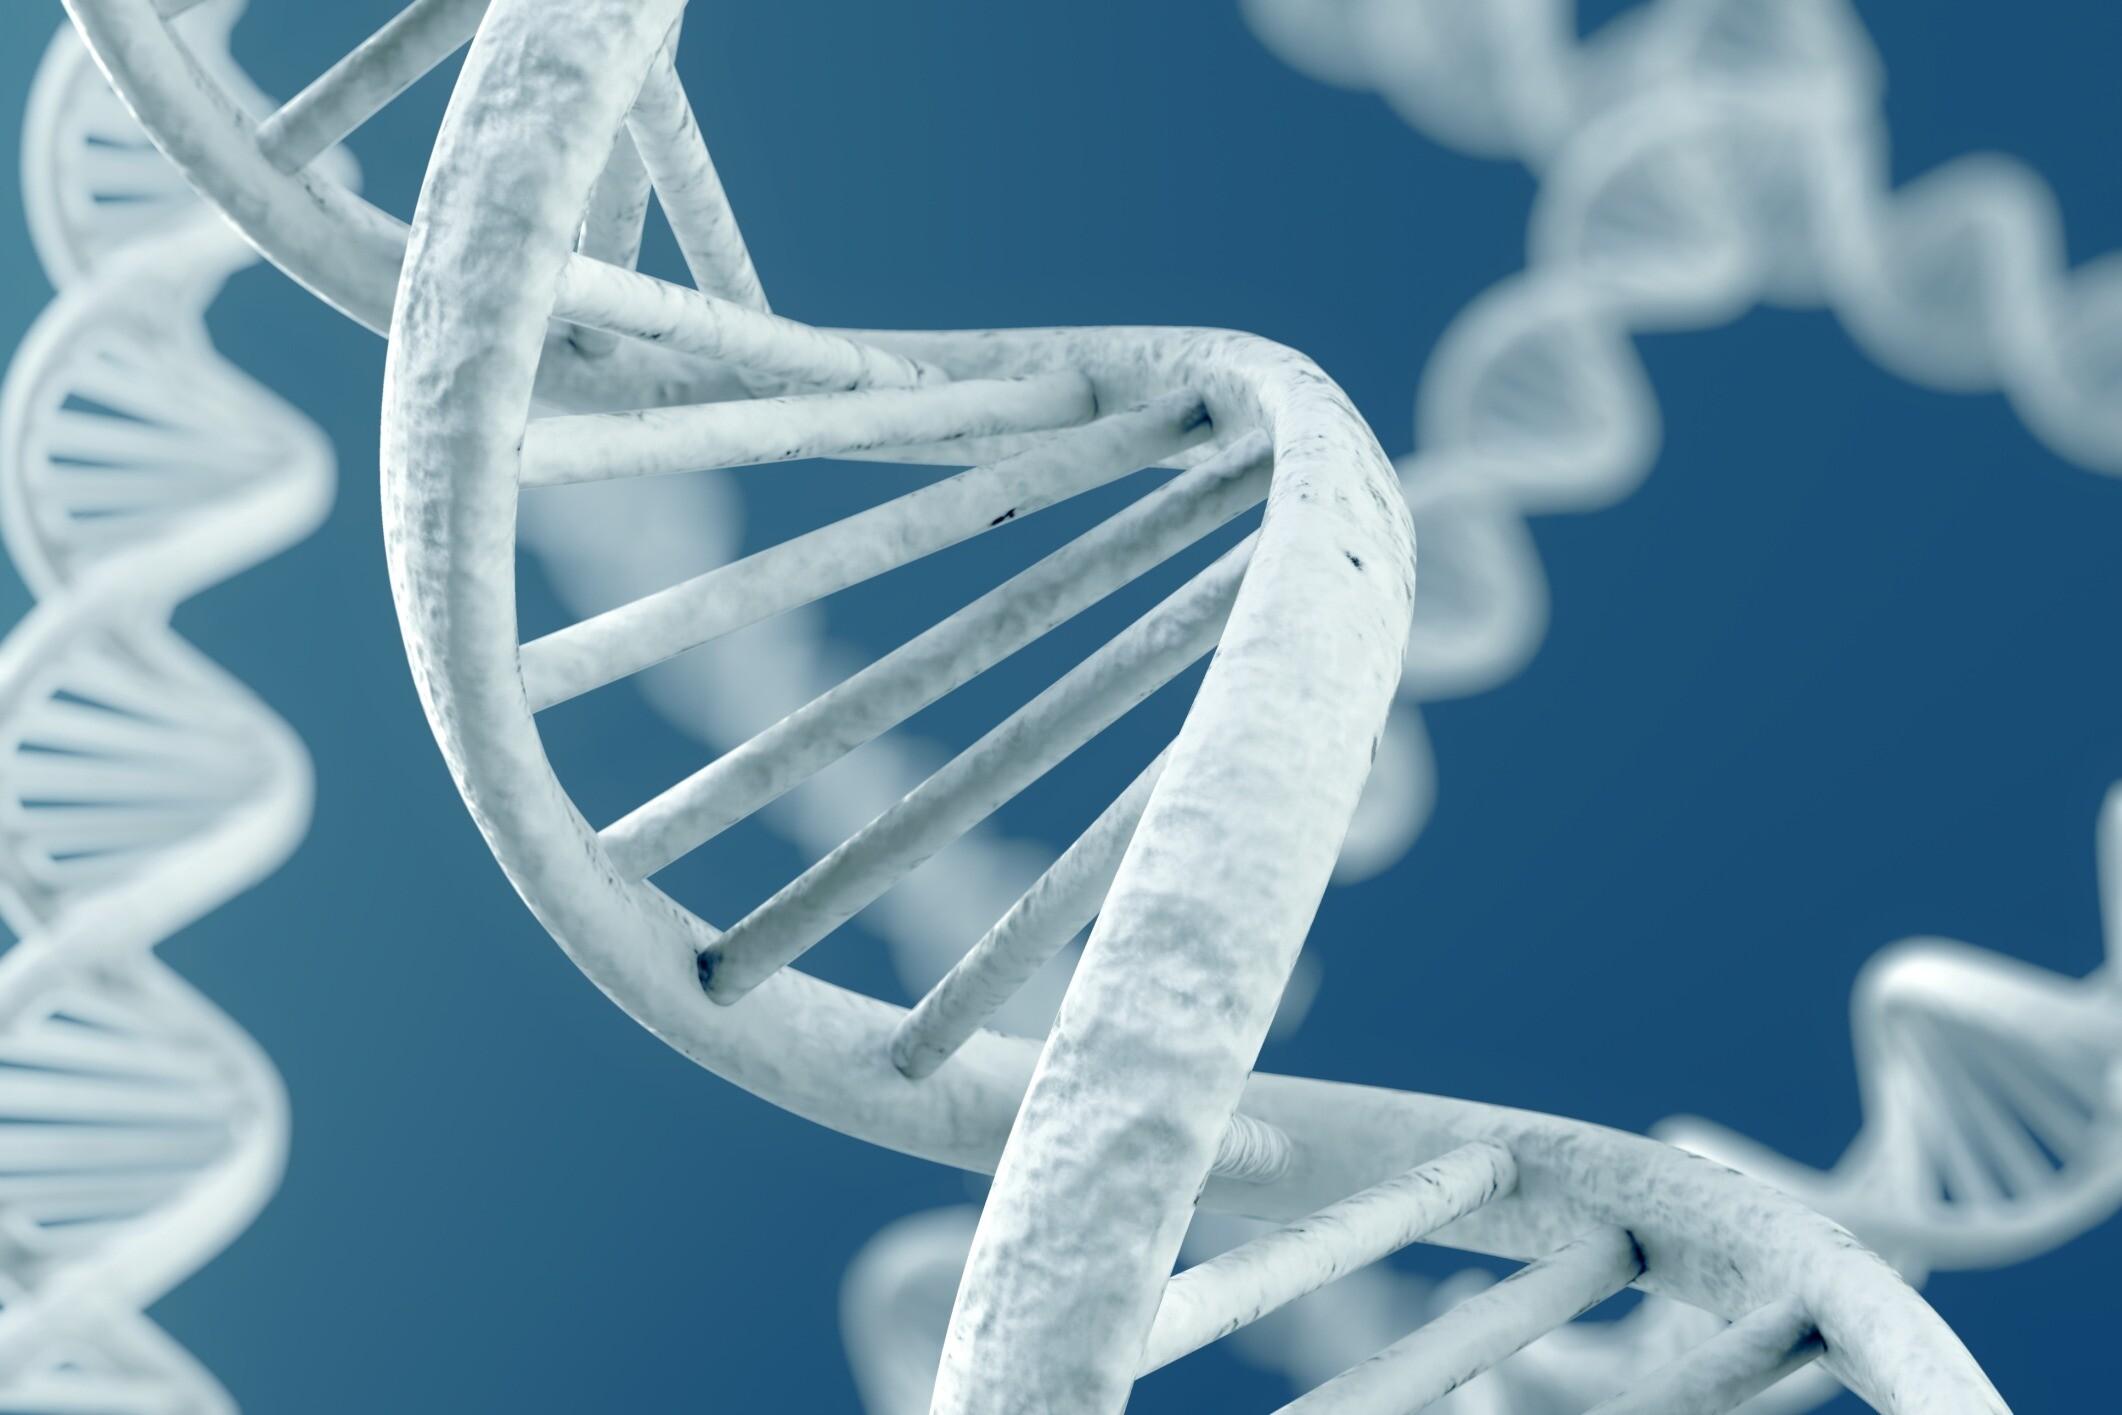 MH genetic analysis